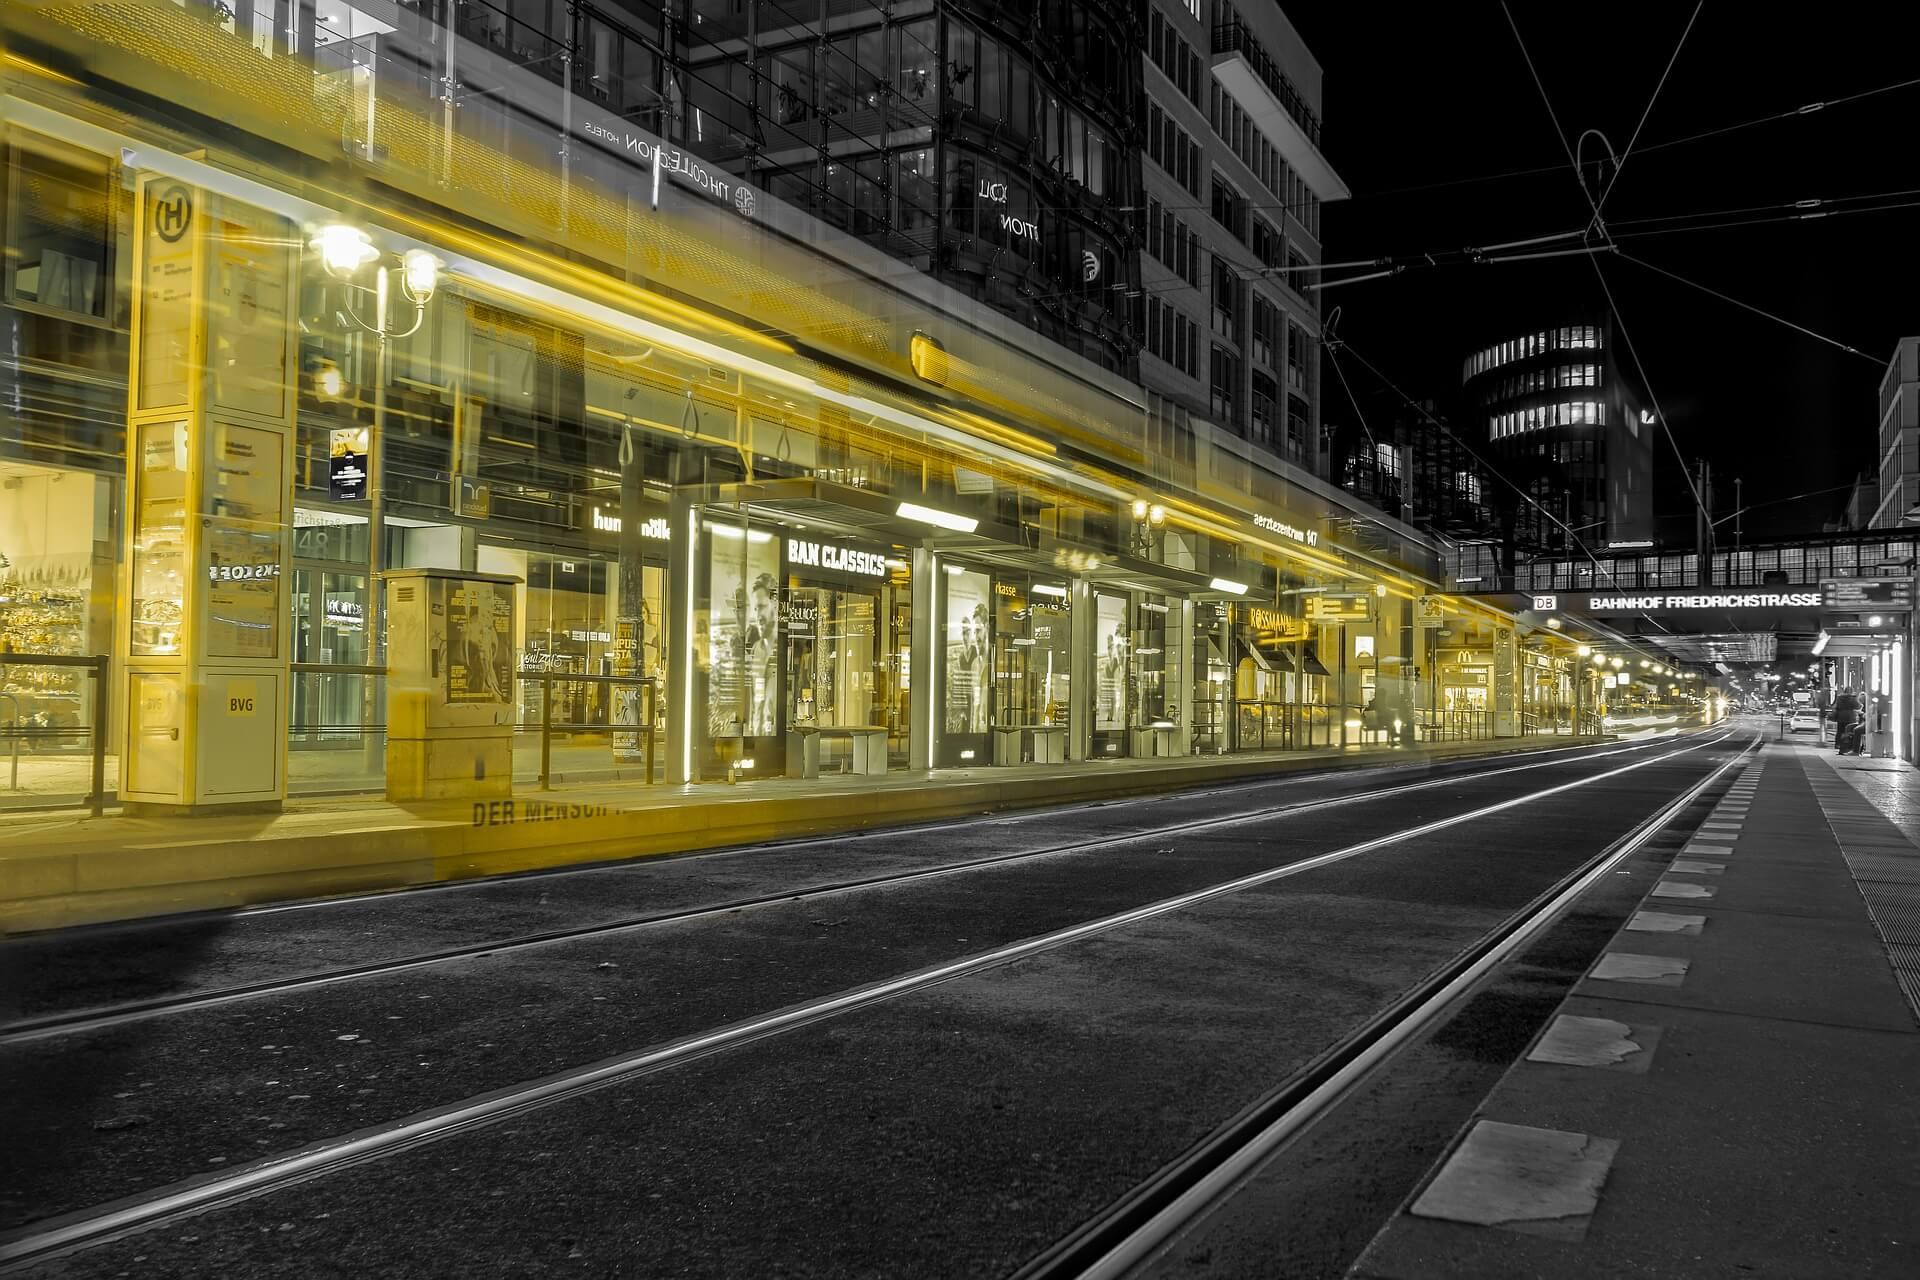 tram-2135042_1920